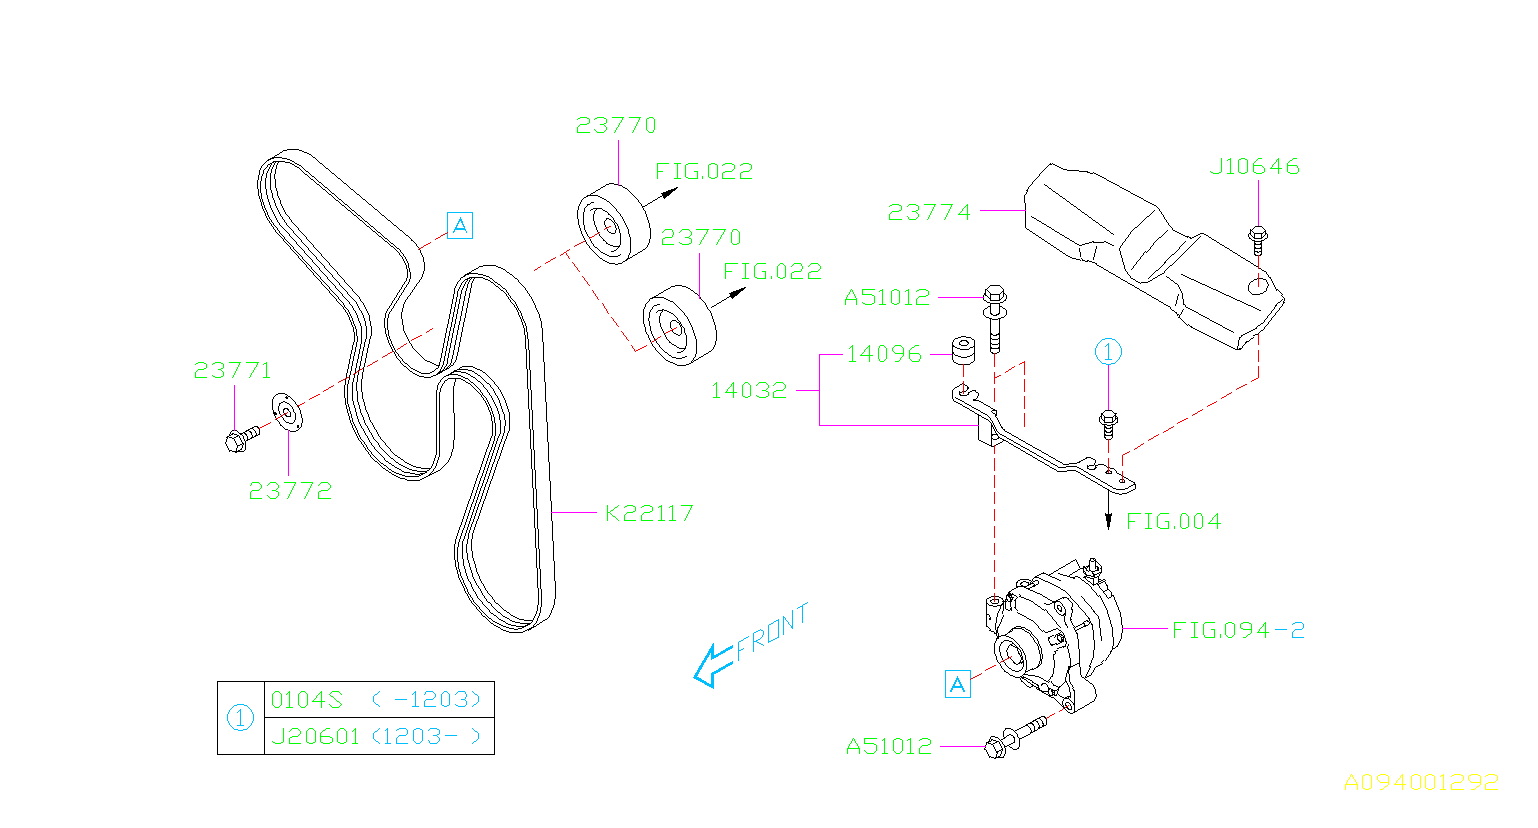 23770aa070 - Pulley-idler  Alternator  System